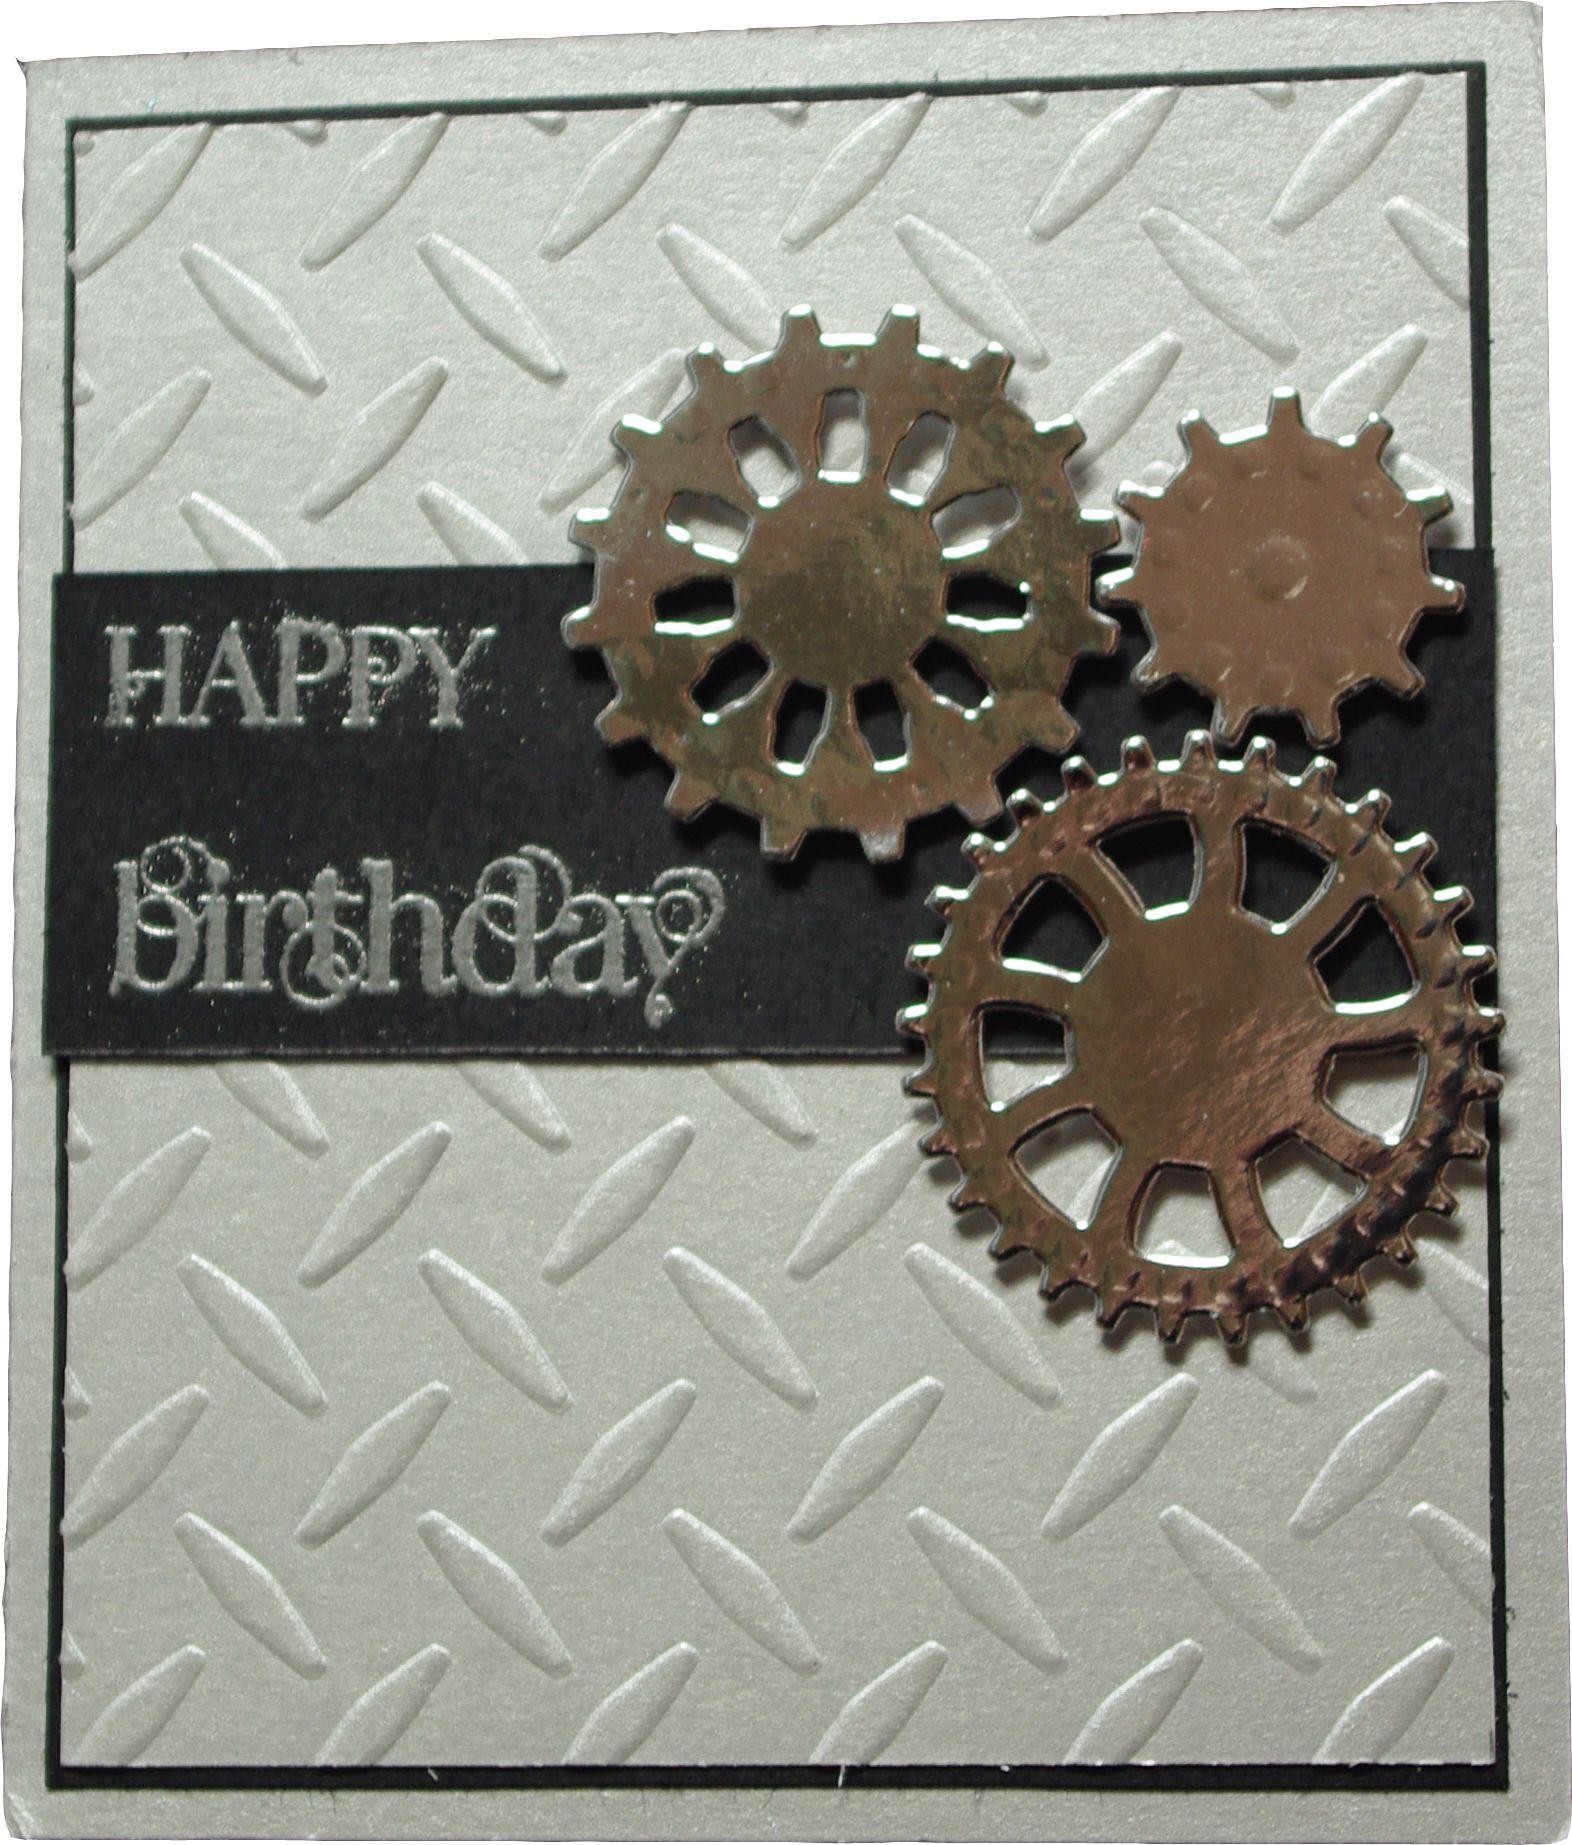 Male Birthday Card | Drenge/herrekort | Pinterest